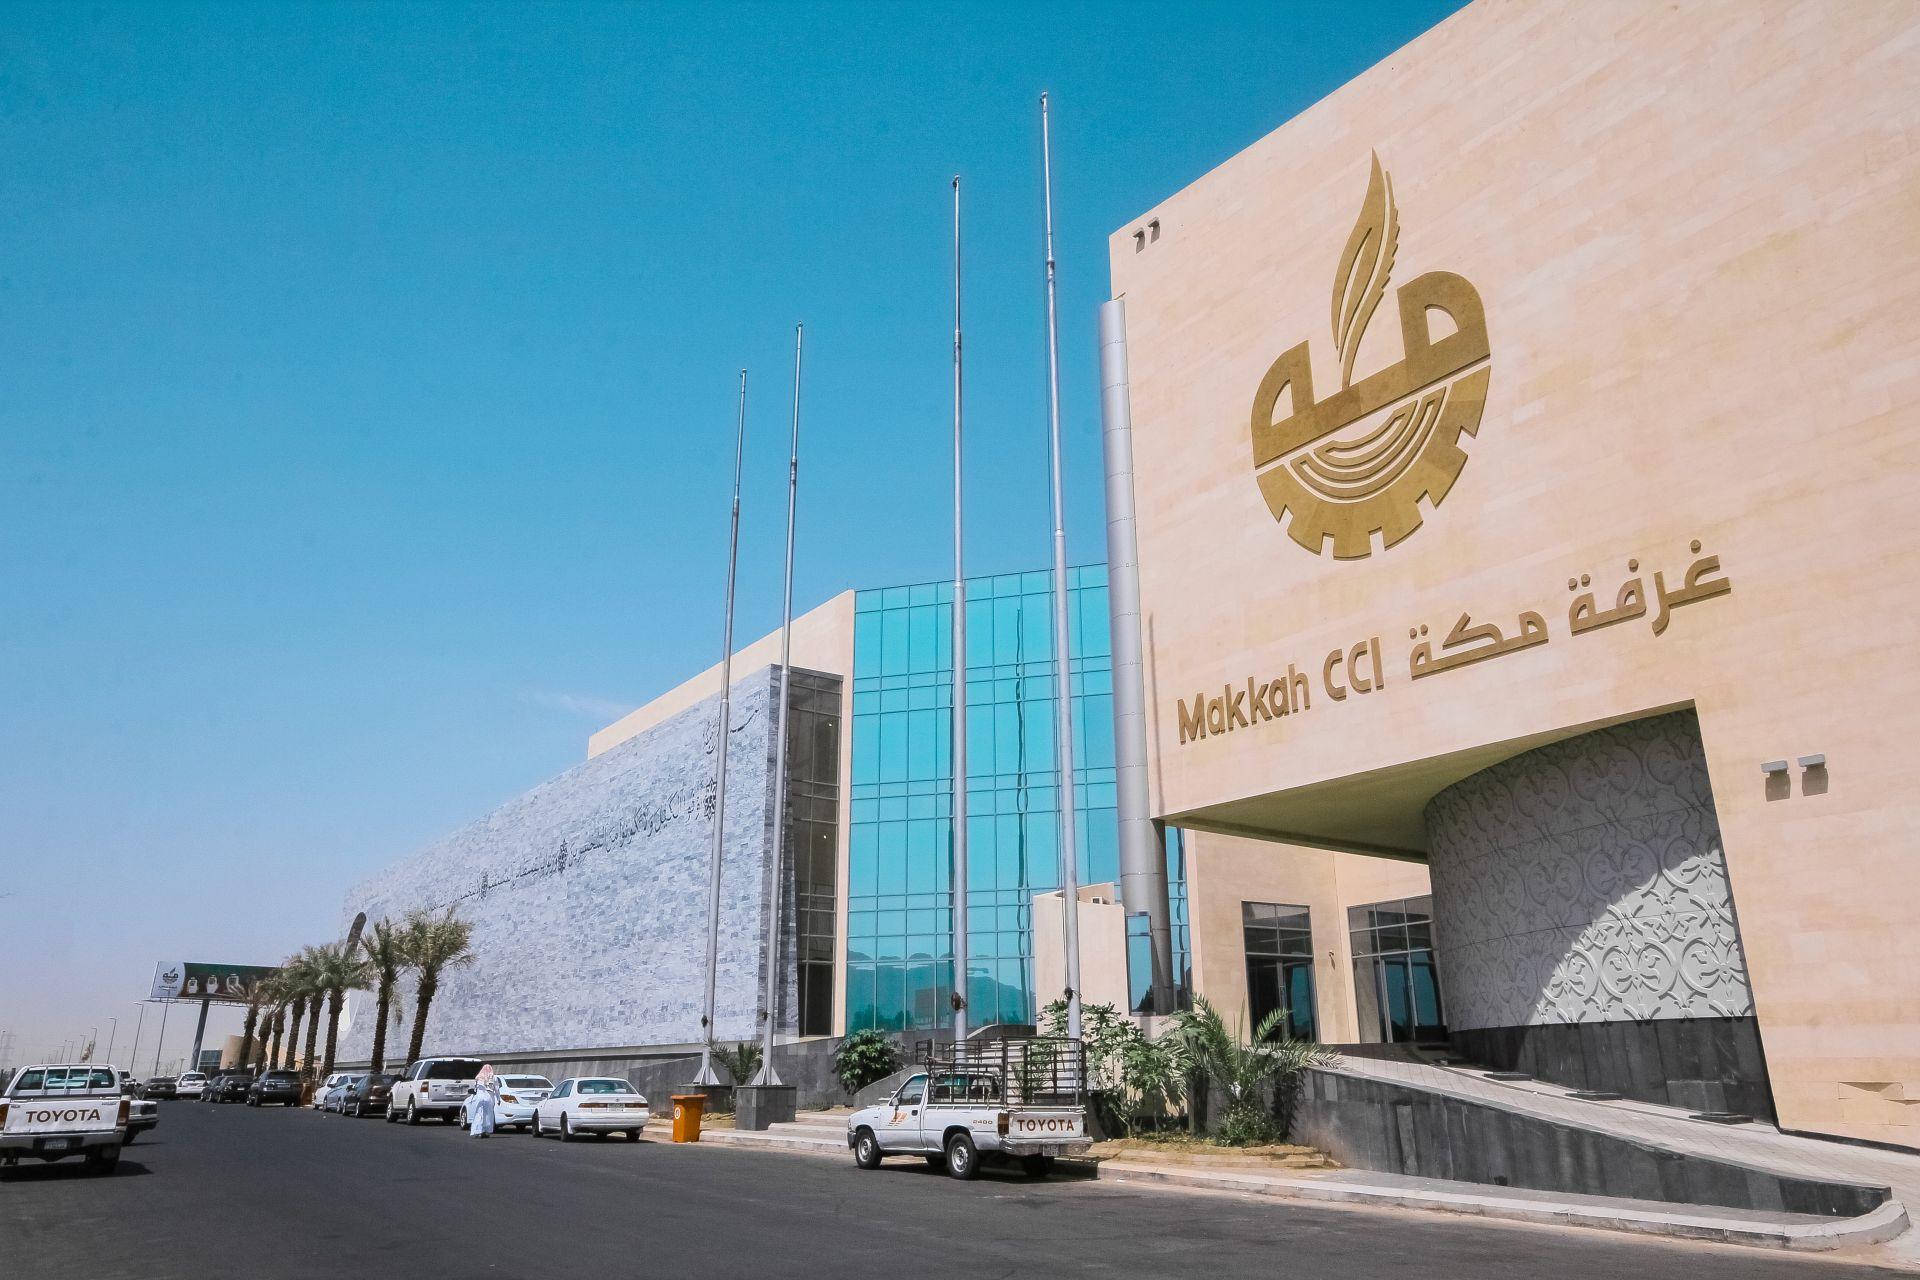 Regus CHAMBER OF COMMERCE BUILDING, Mecca